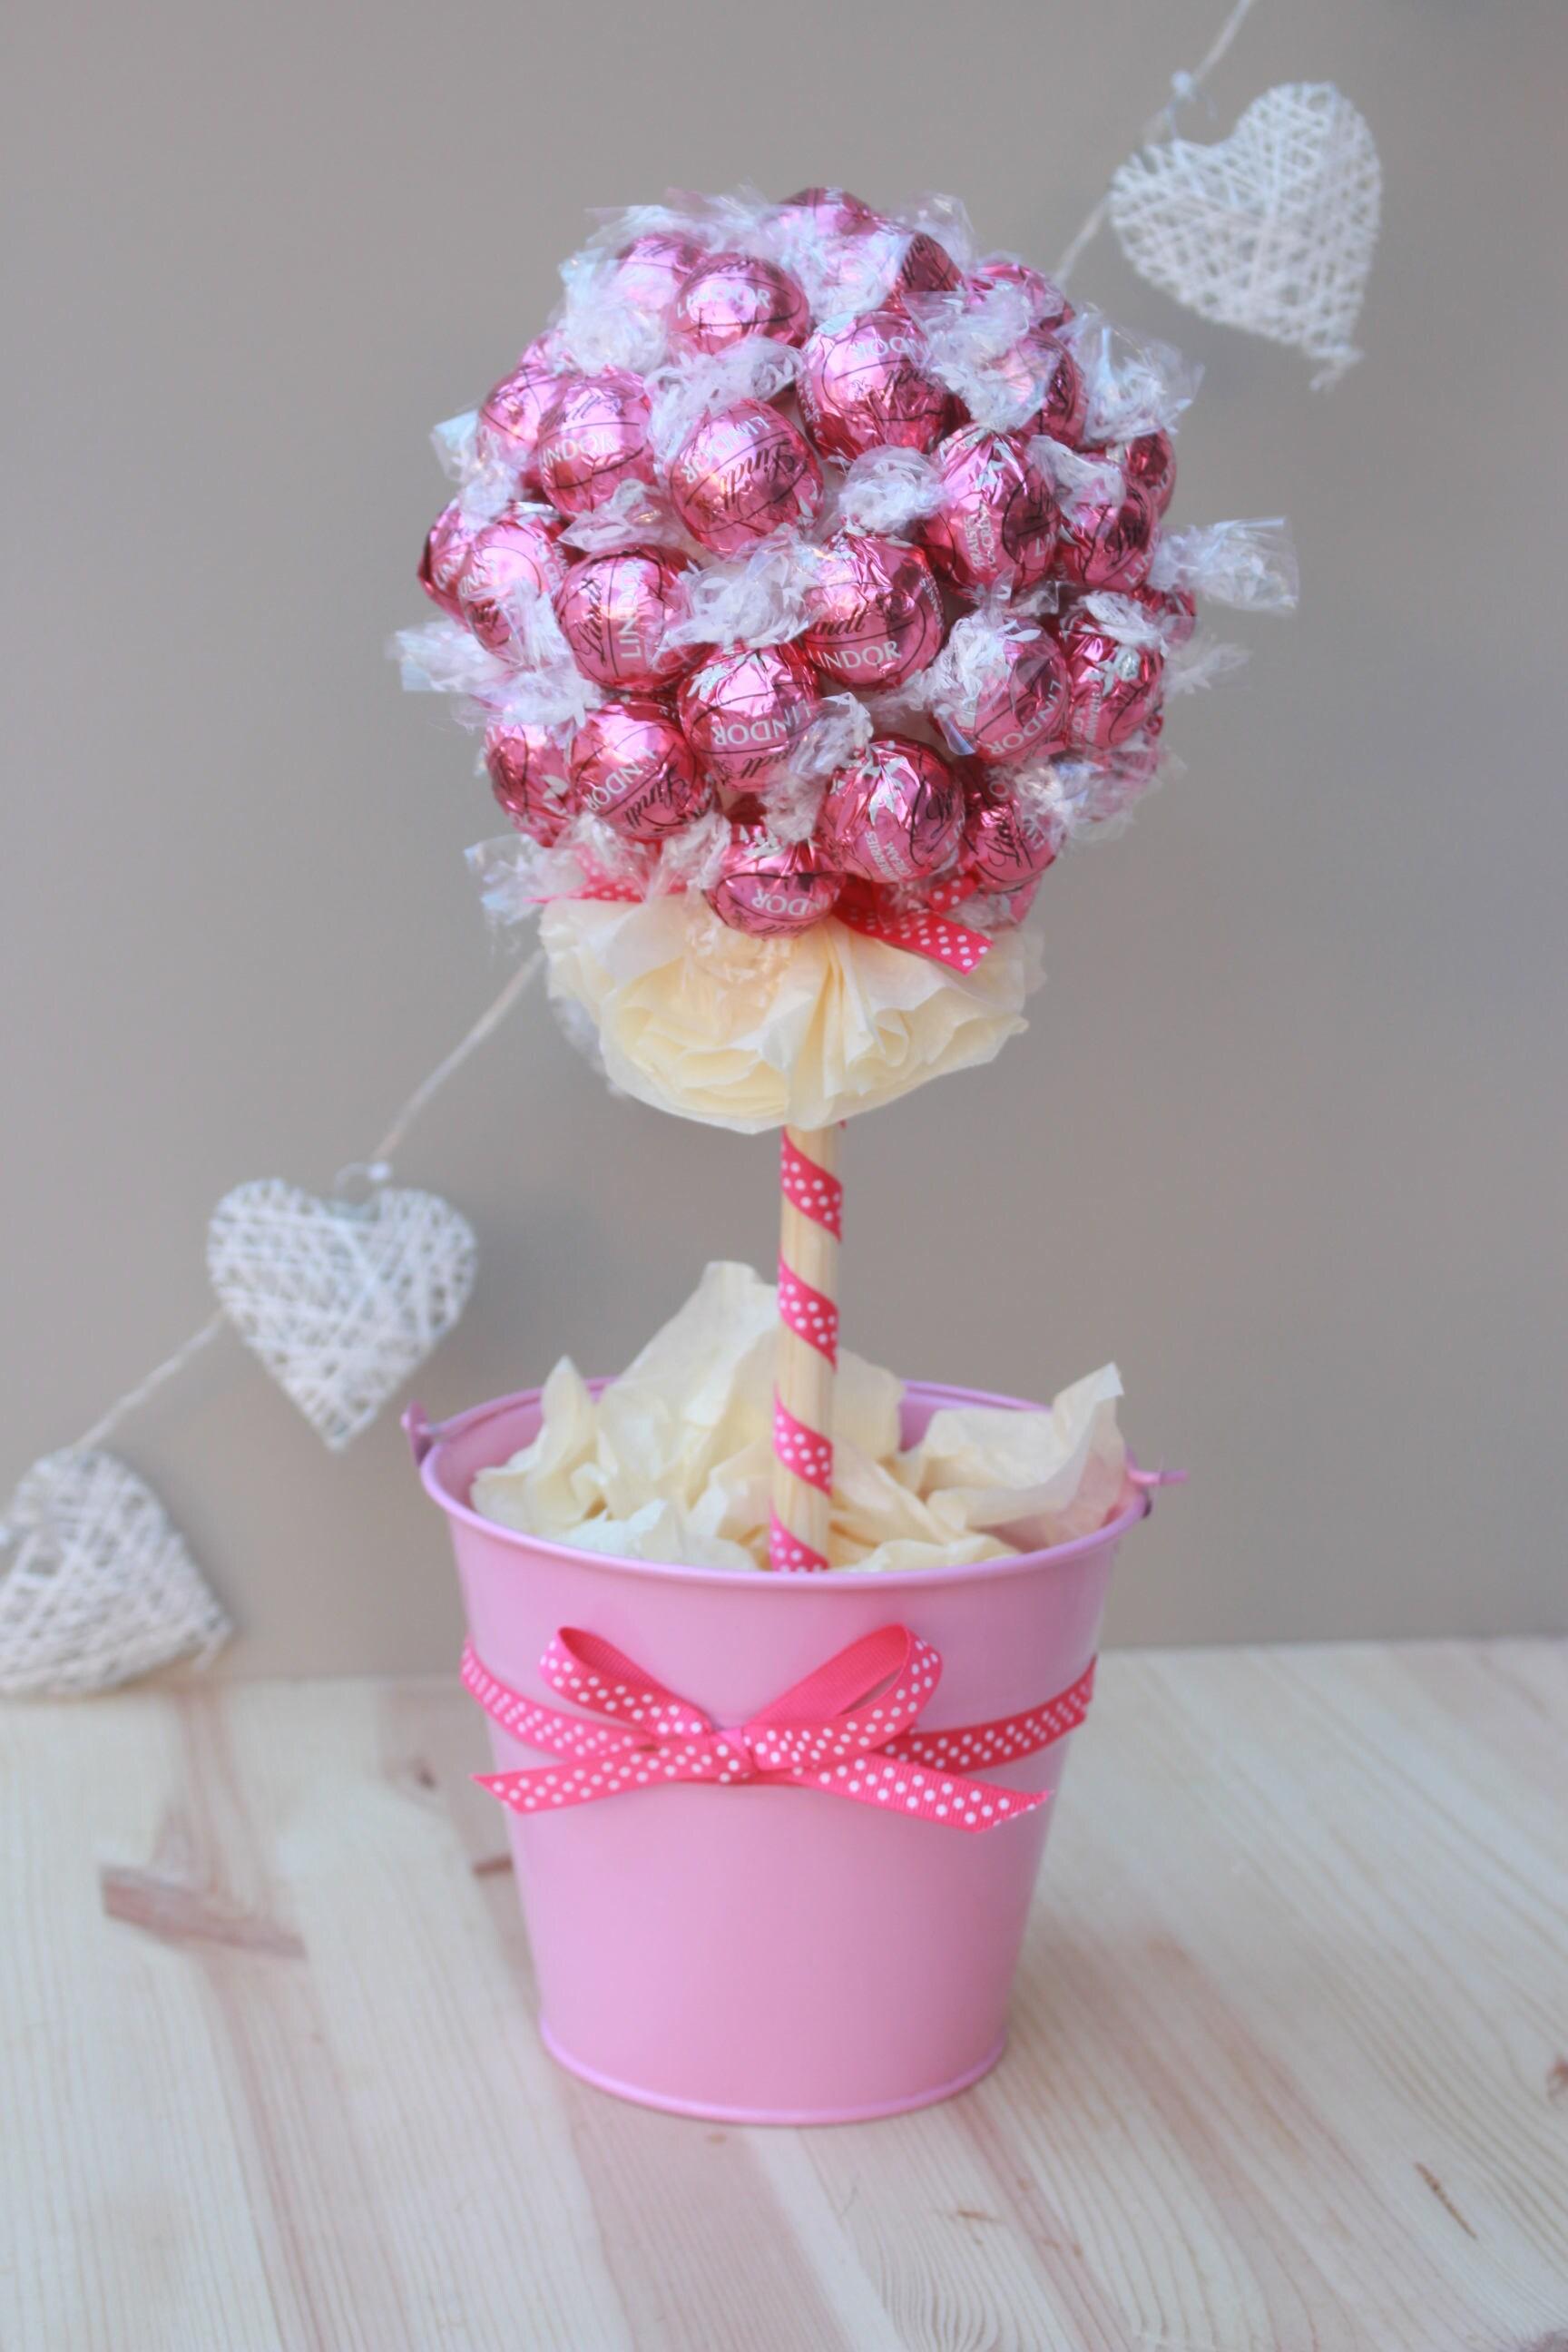 Sweet Tree Lindt Lindor Pink Lindt Chocolate Bouquet